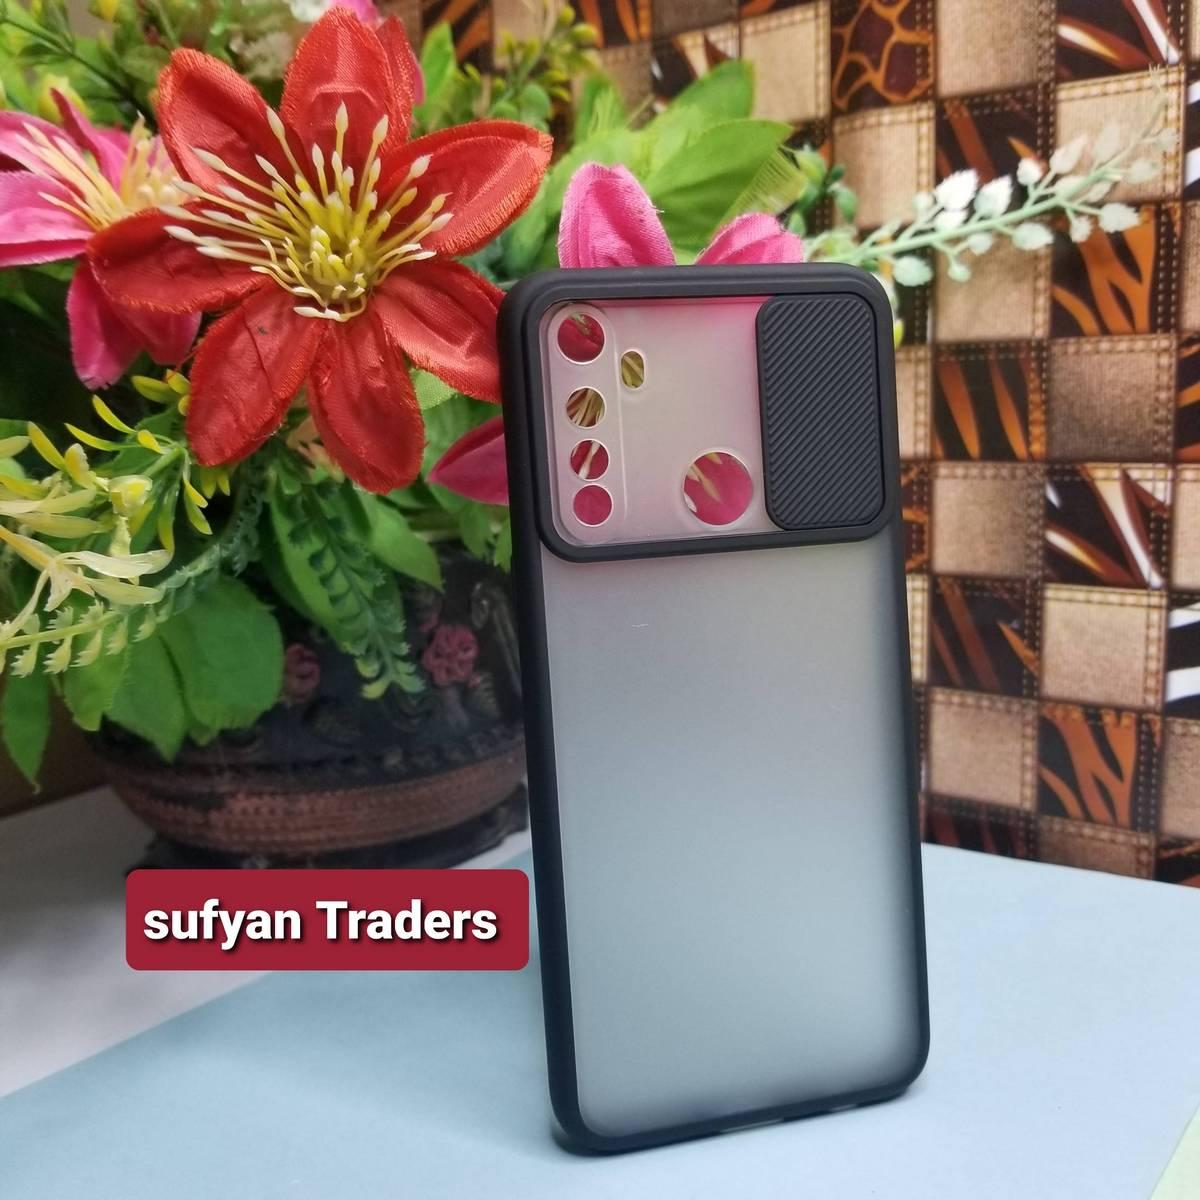 realme_5 / 5i window slide camera protection matte back cover case Premium Luxury Highest Quality for REALME_5/5i